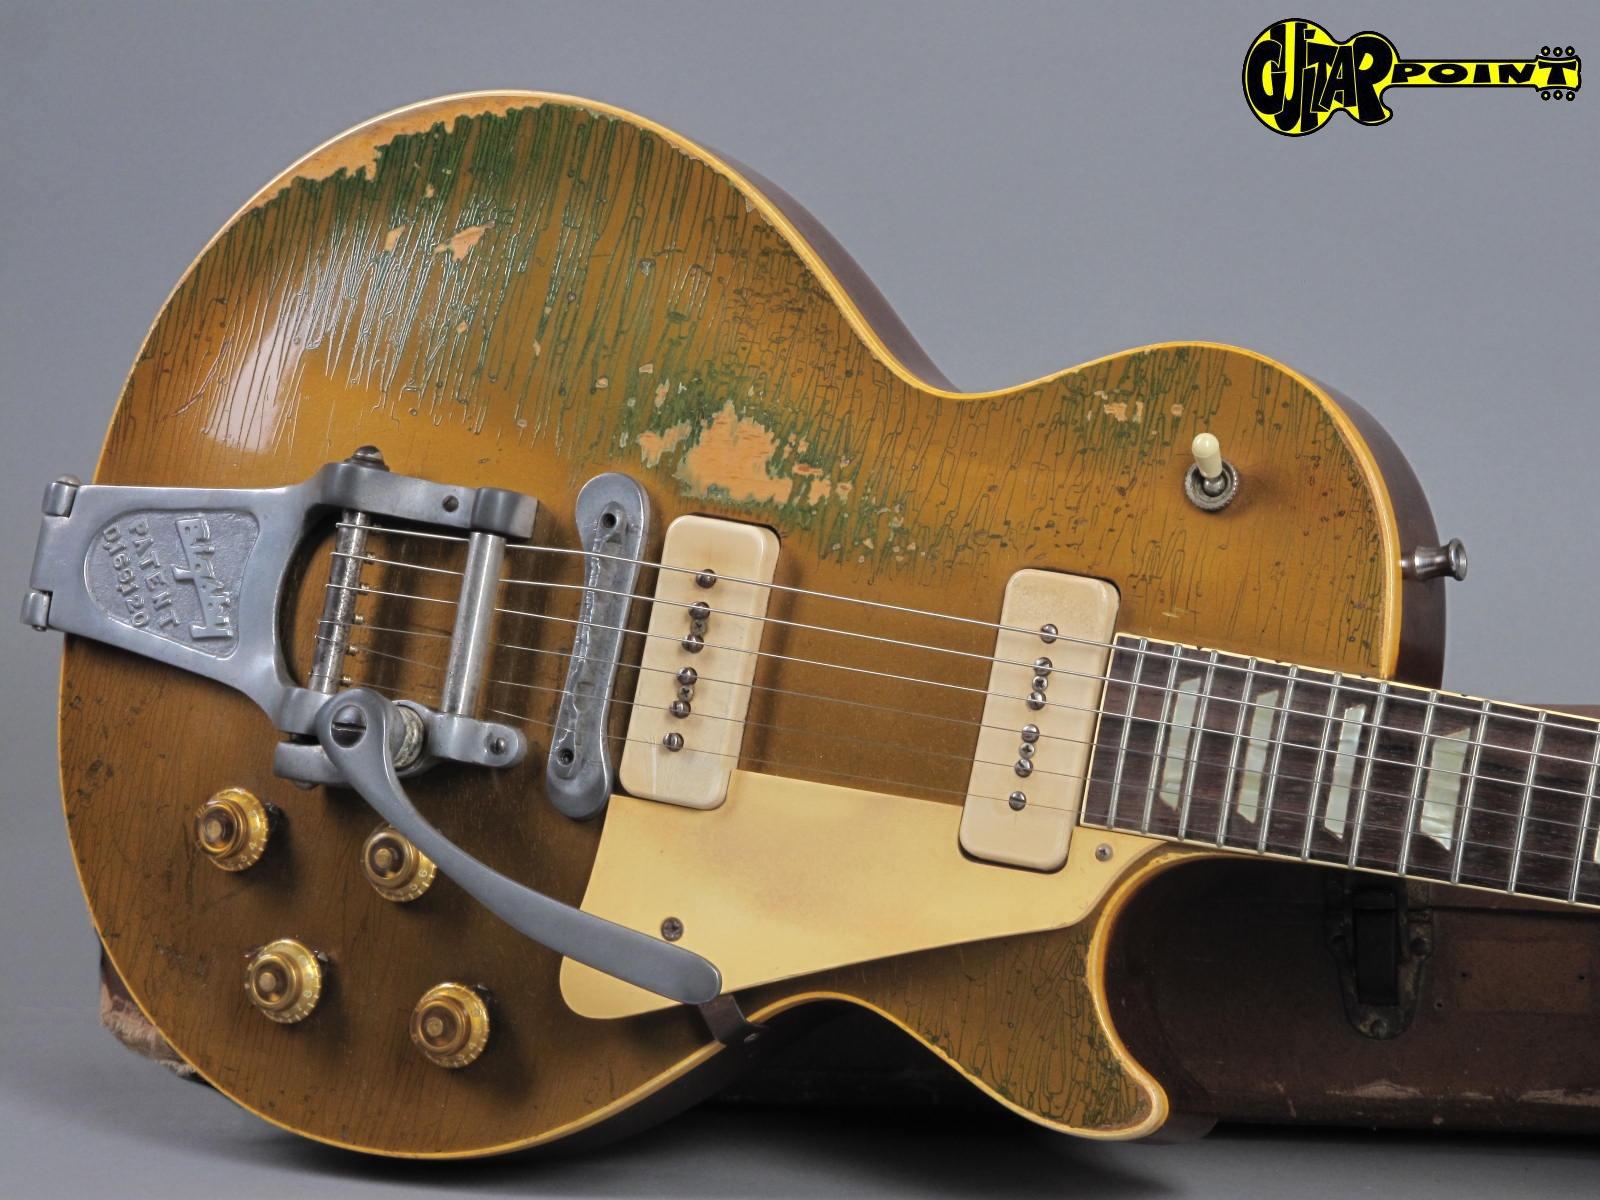 https://guitarpoint.de/app/uploads/products/1956-gibson-les-paul-standard-goldtop-factory-bigsby/Gibson56LPGT_614717_19.jpg